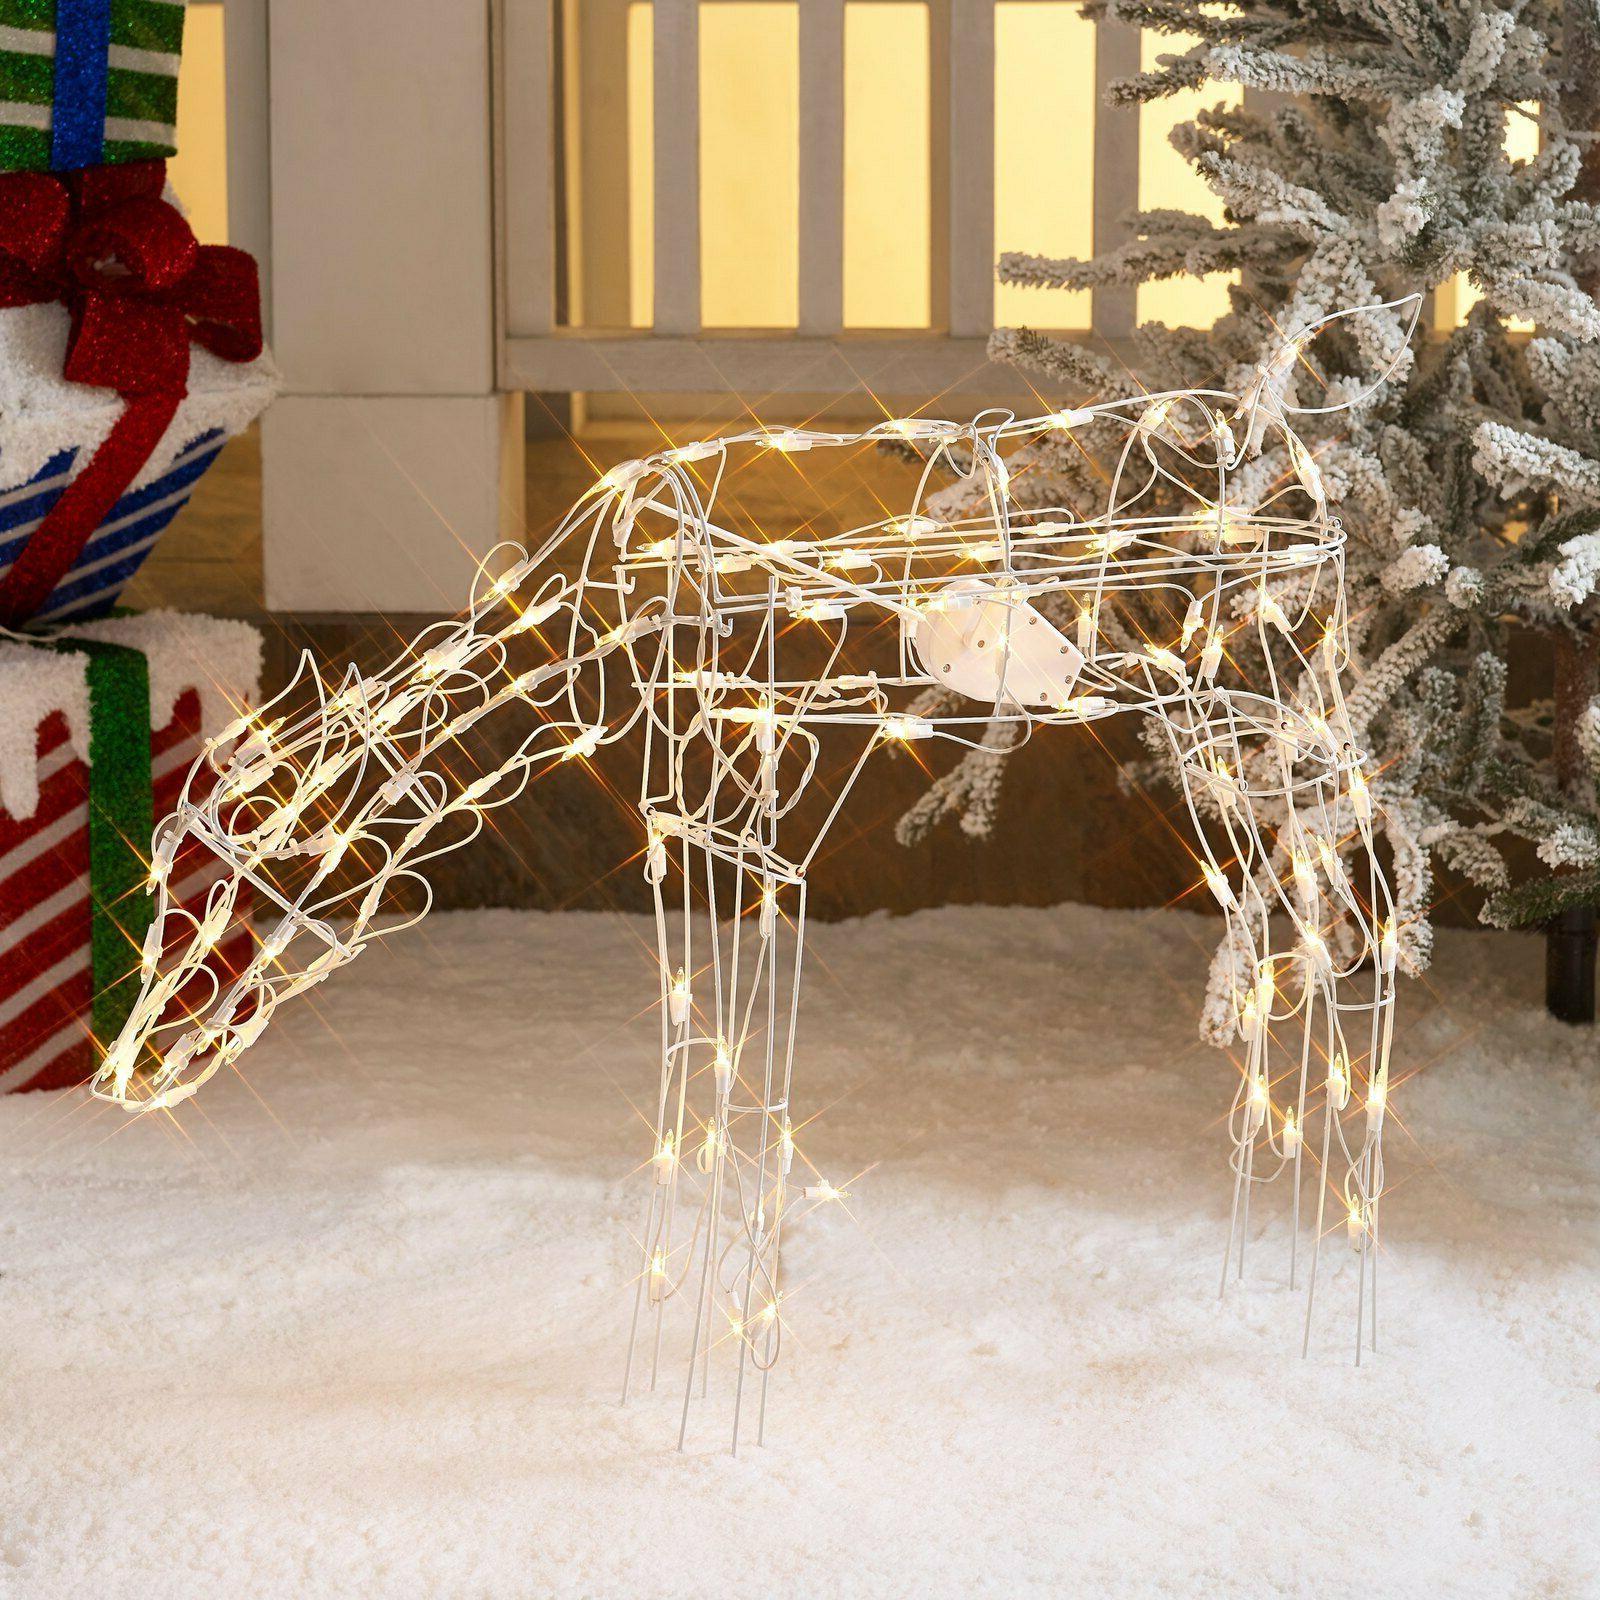 Christmas 40 INN Doe Deer Outdoor Yard Decor Xmas Sculpture